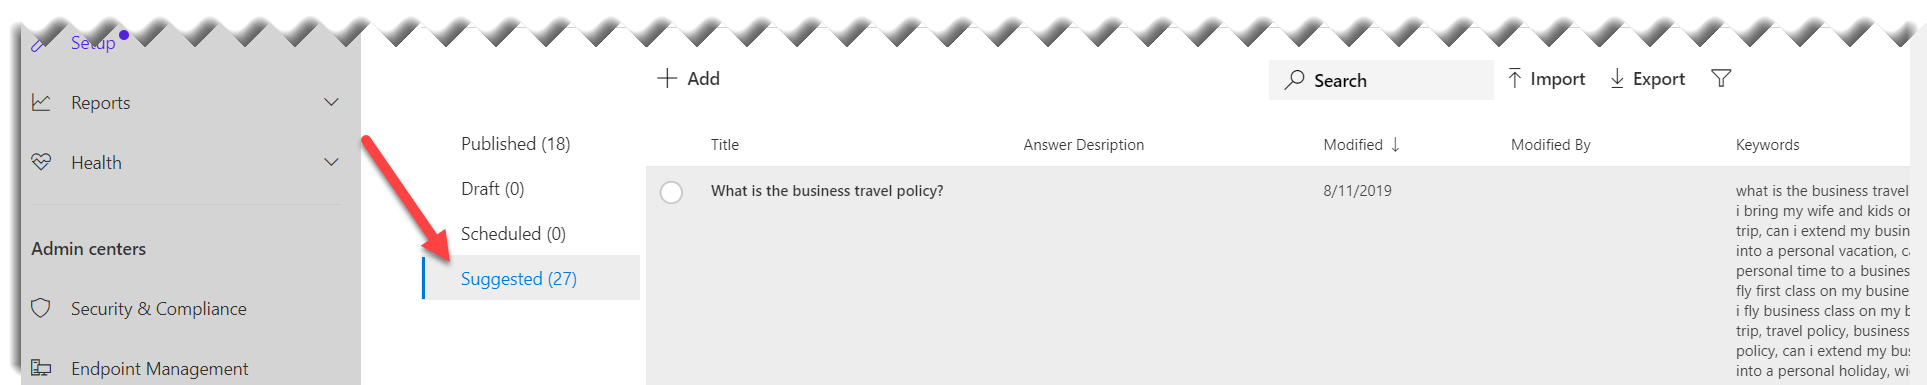 screenshot of Microsoft search admin center